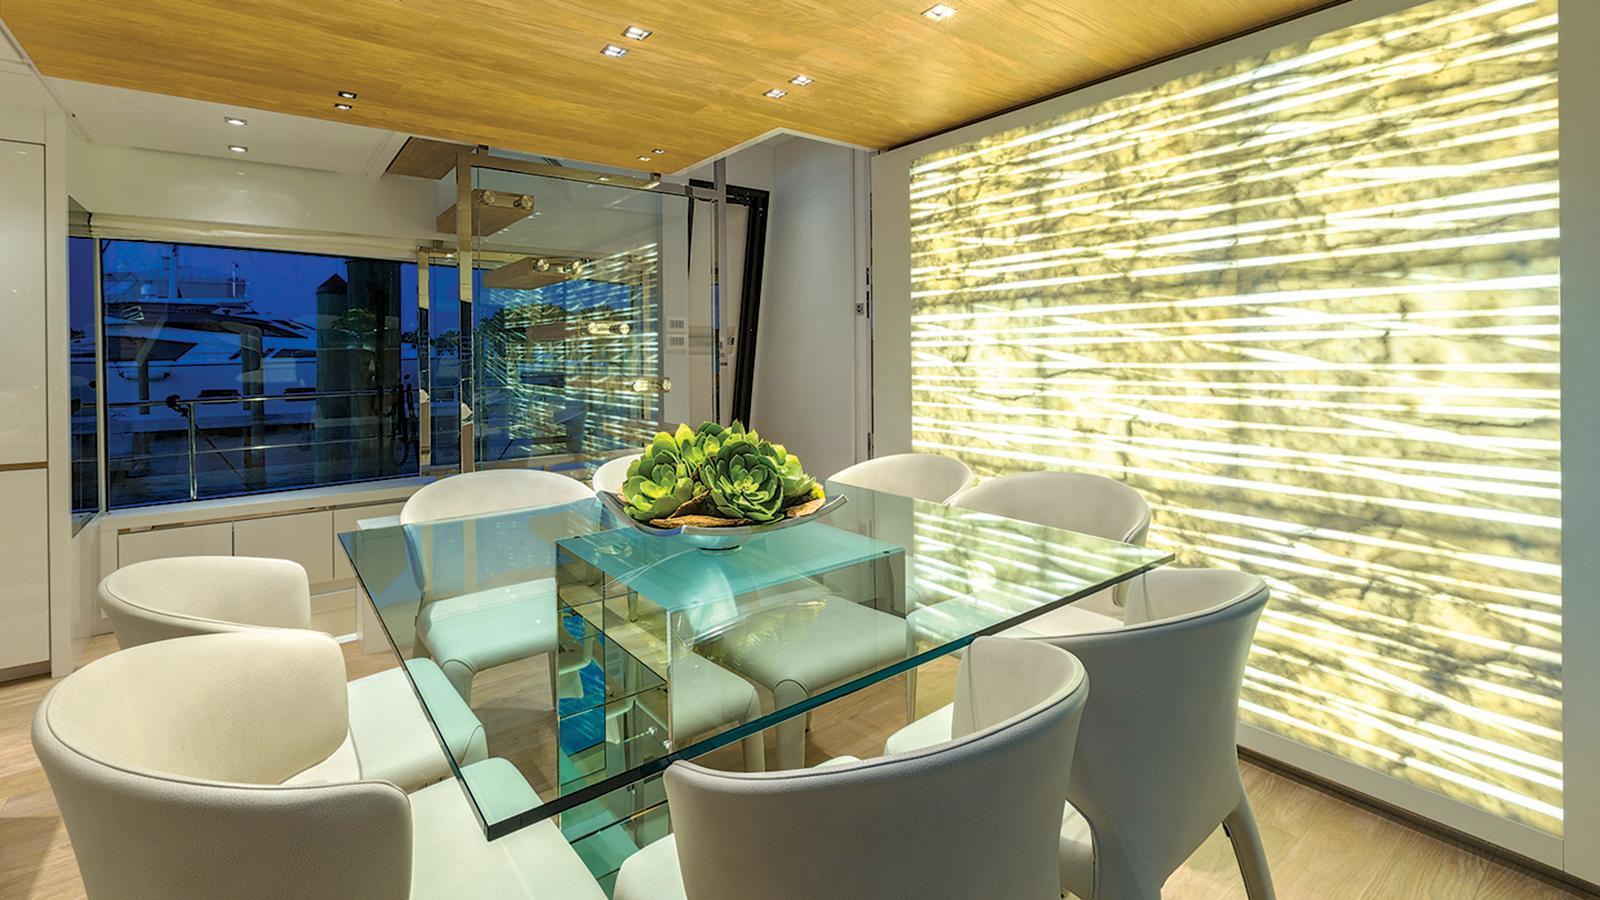 hull 651 motoryacht sanlorenzo sl86 27m 2016 dining area credit jim raycroft